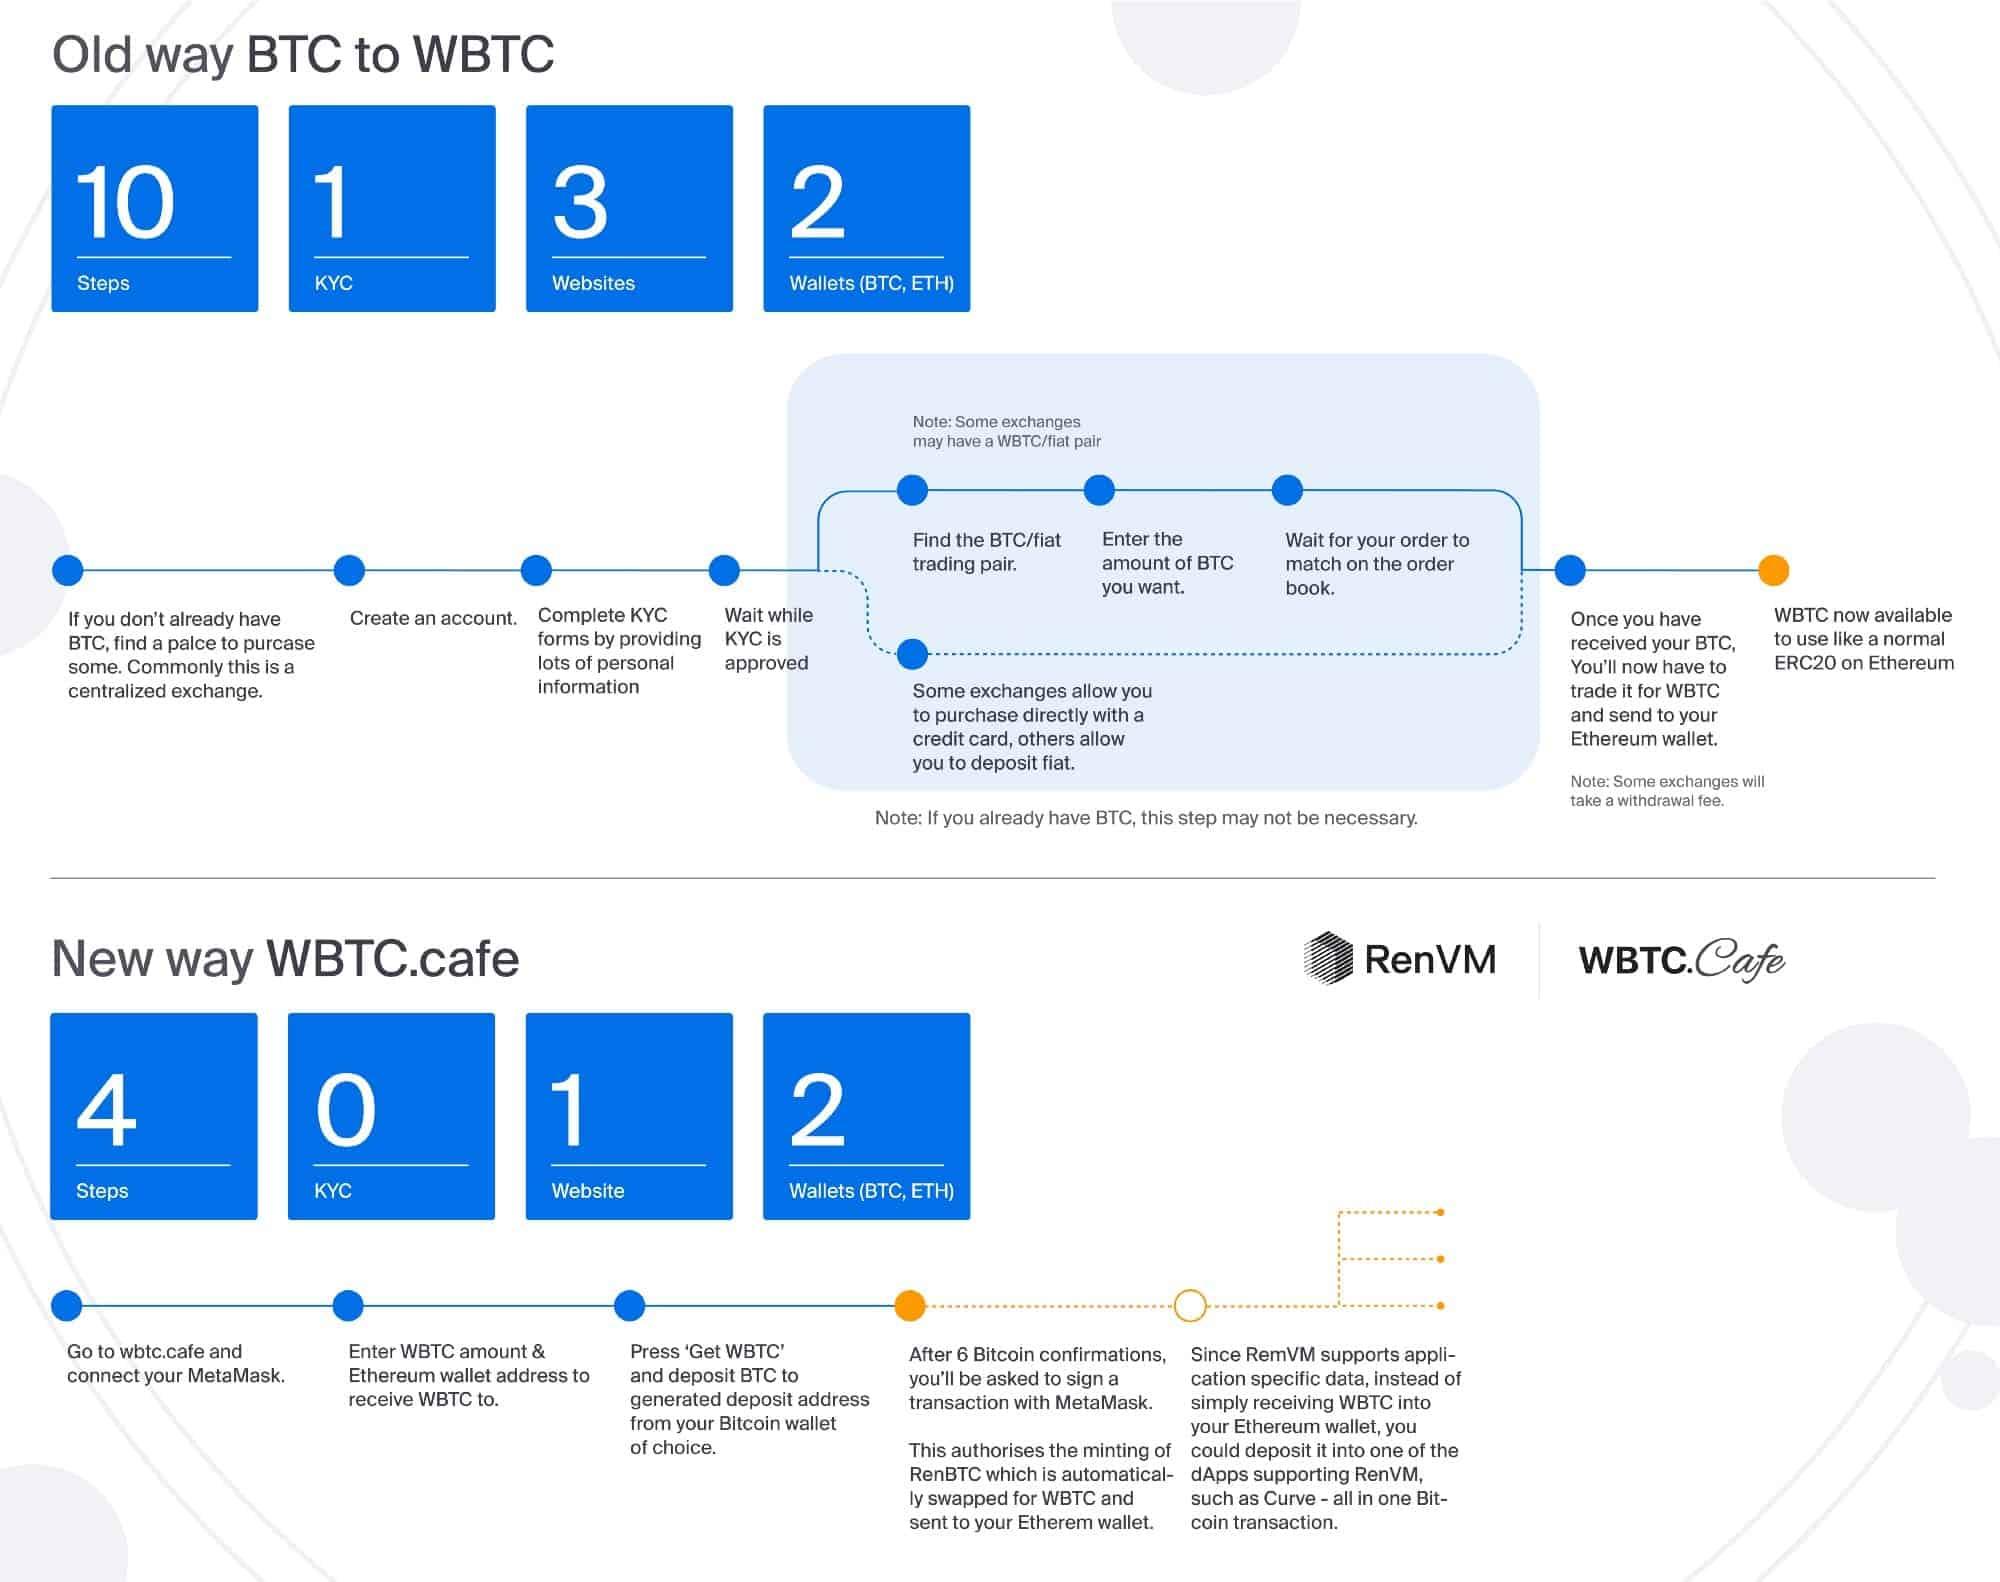 BTC To WBTC Using WBTC.Cafe. Source: Ren Medium